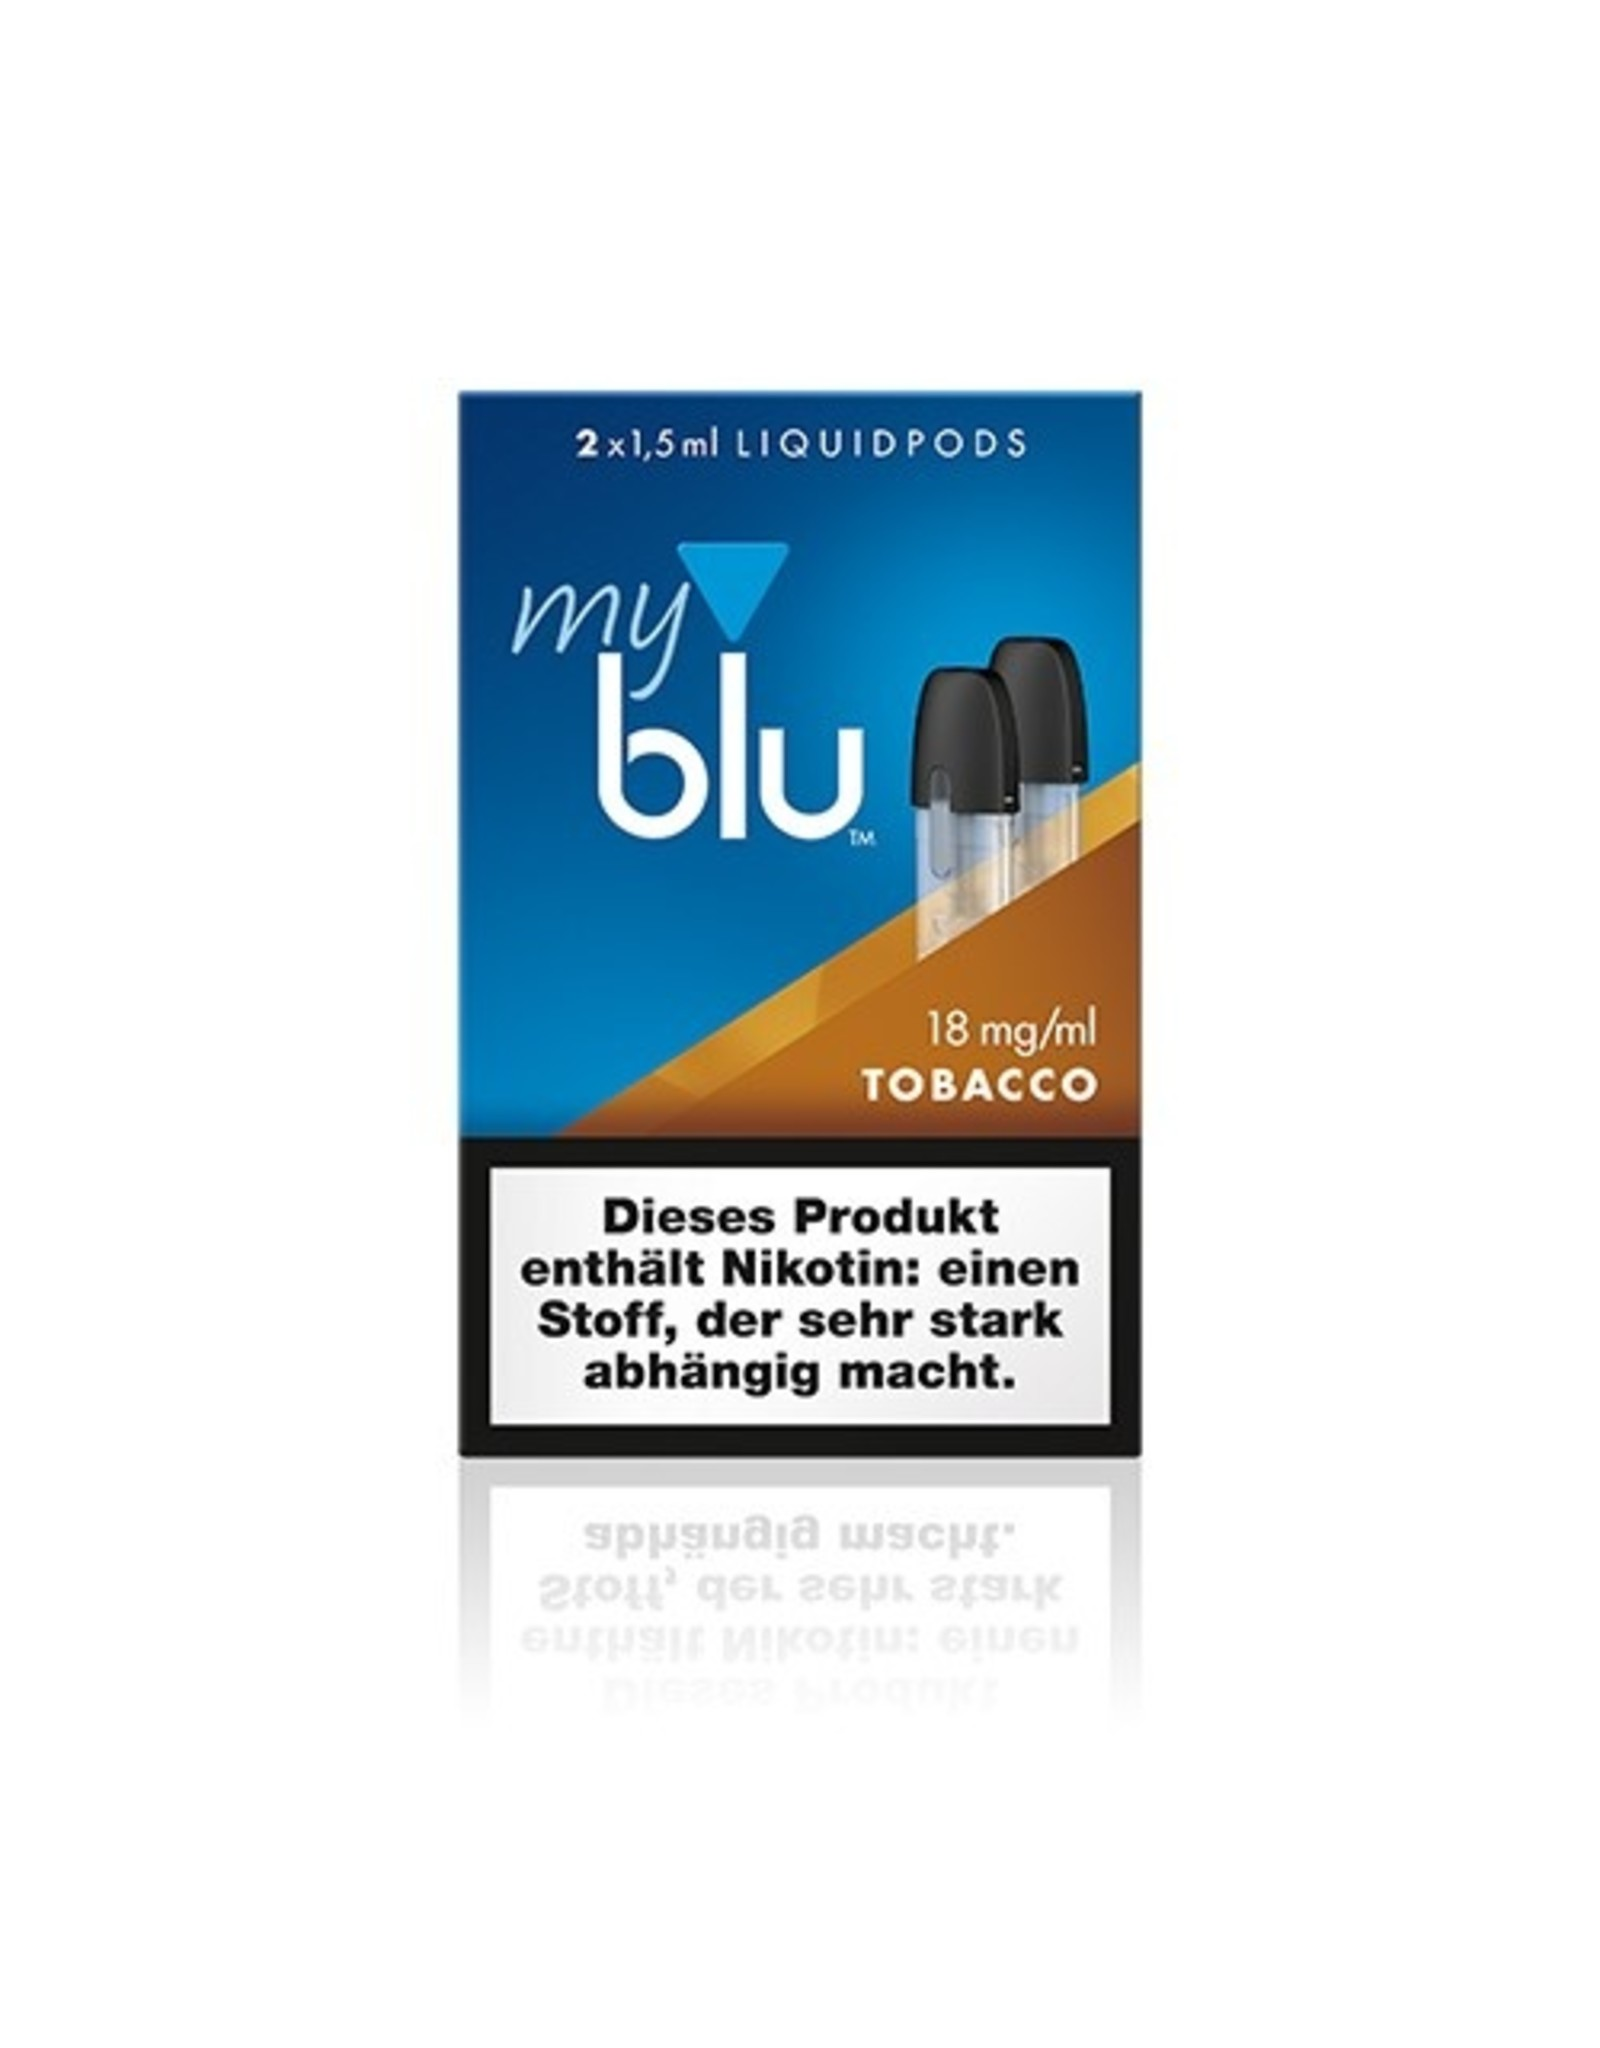 My Blu myblu TOBACCO ROASTED BLEND 18mg/ml LIQUIDPOD